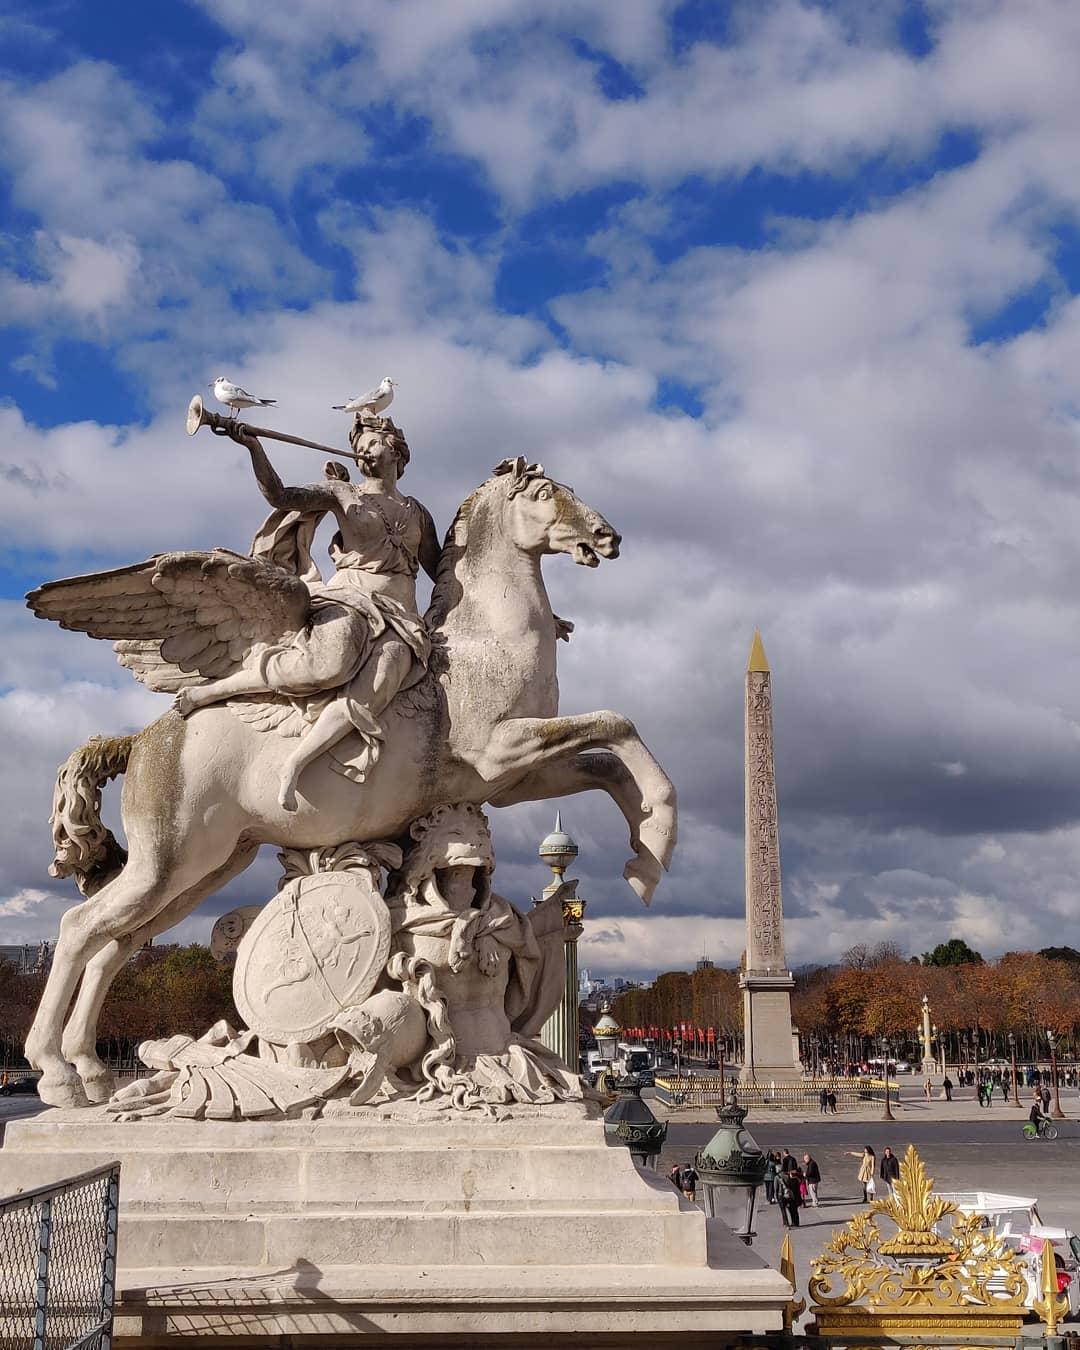 A statue from the Tuileries Garden in Paris. The obelisk of Luxor in Place de la Concorde